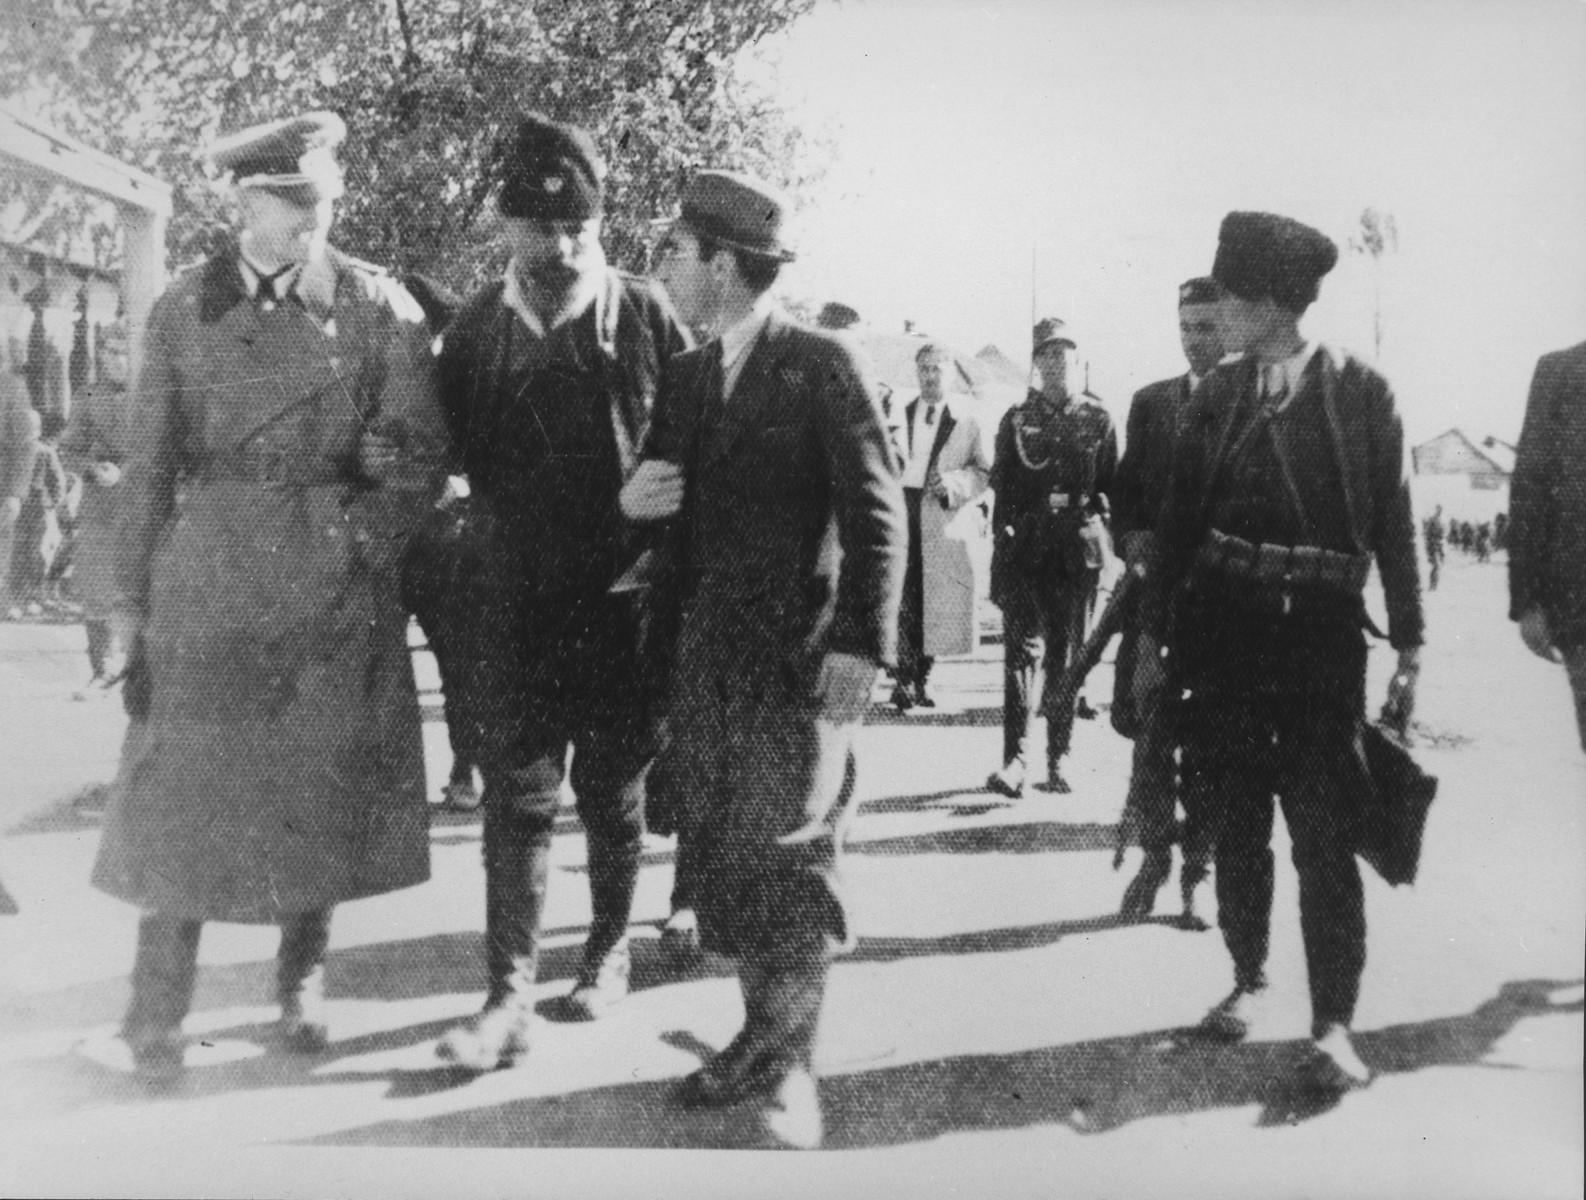 A German military officer converses with  Kosta Pecanac (the pre-war president of the Chetniks) and  Xhafer Deva (a collaborator from Kosovo) in Podujevo.